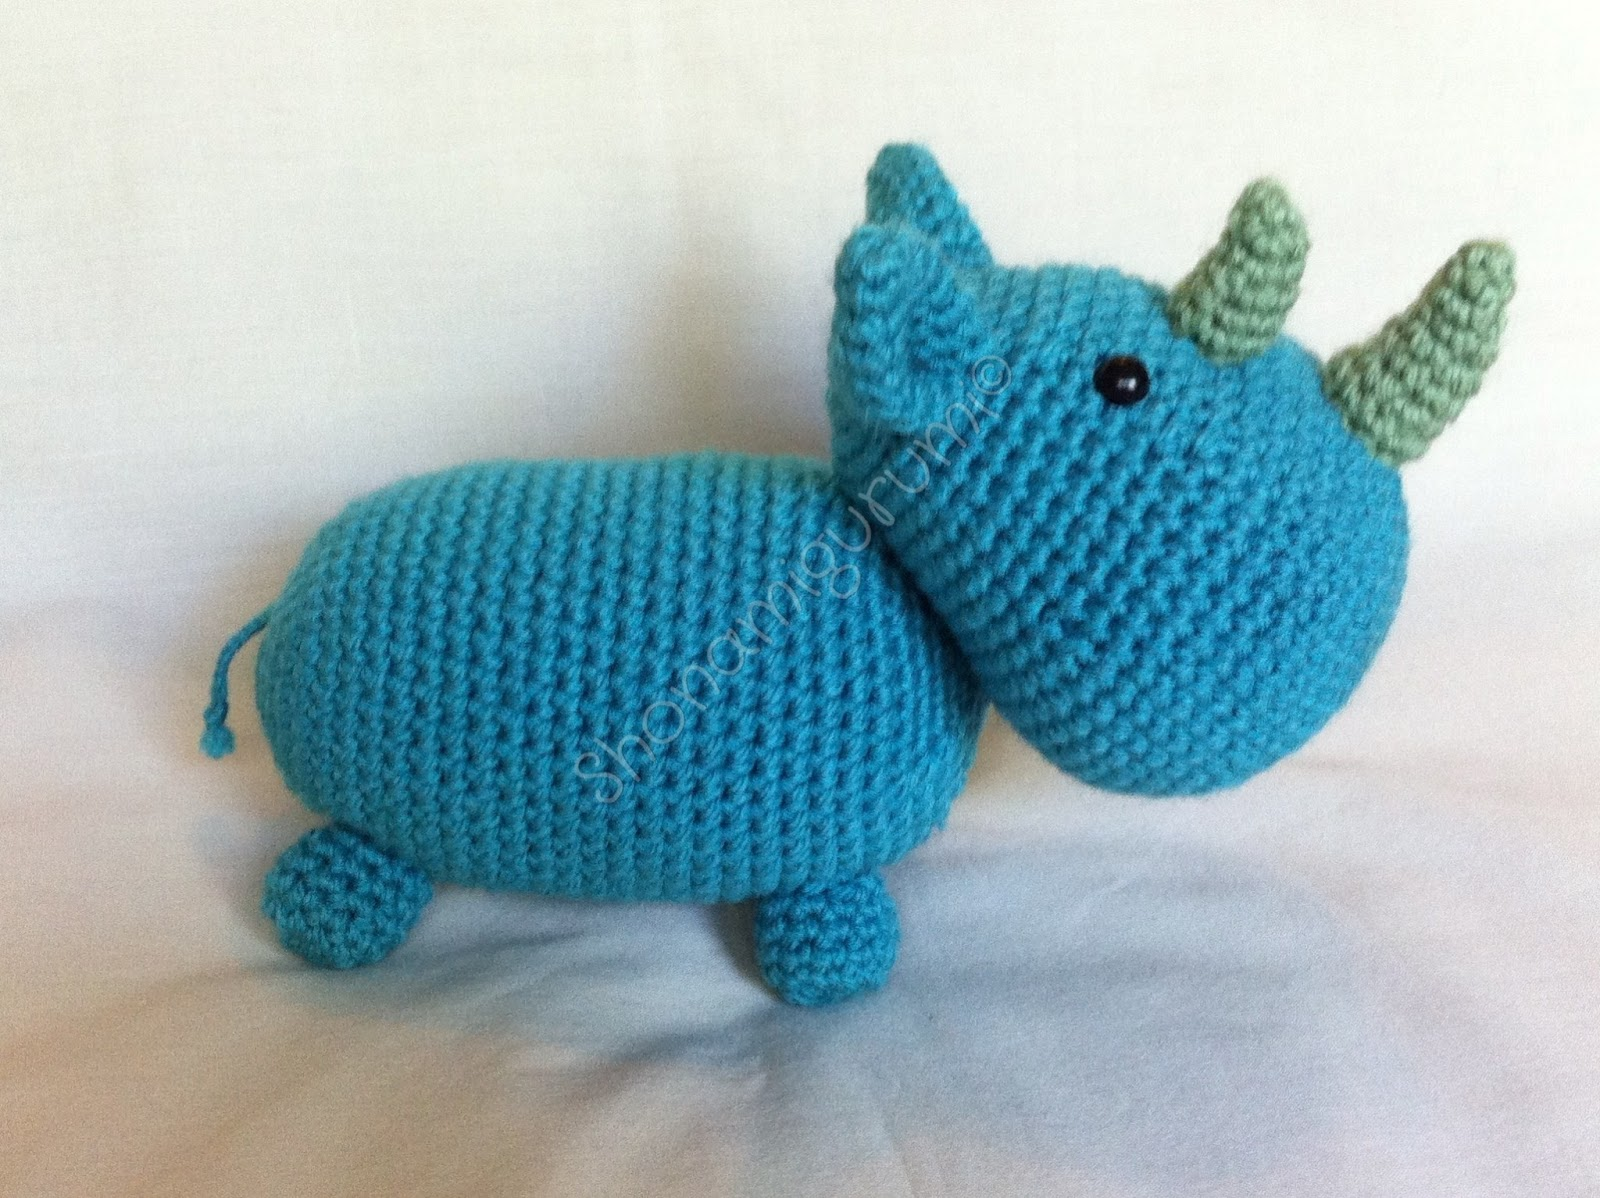 Crochet Star Wars Amigurumi Patterns : Shonamigurumi?: Ryno Rhinoceros